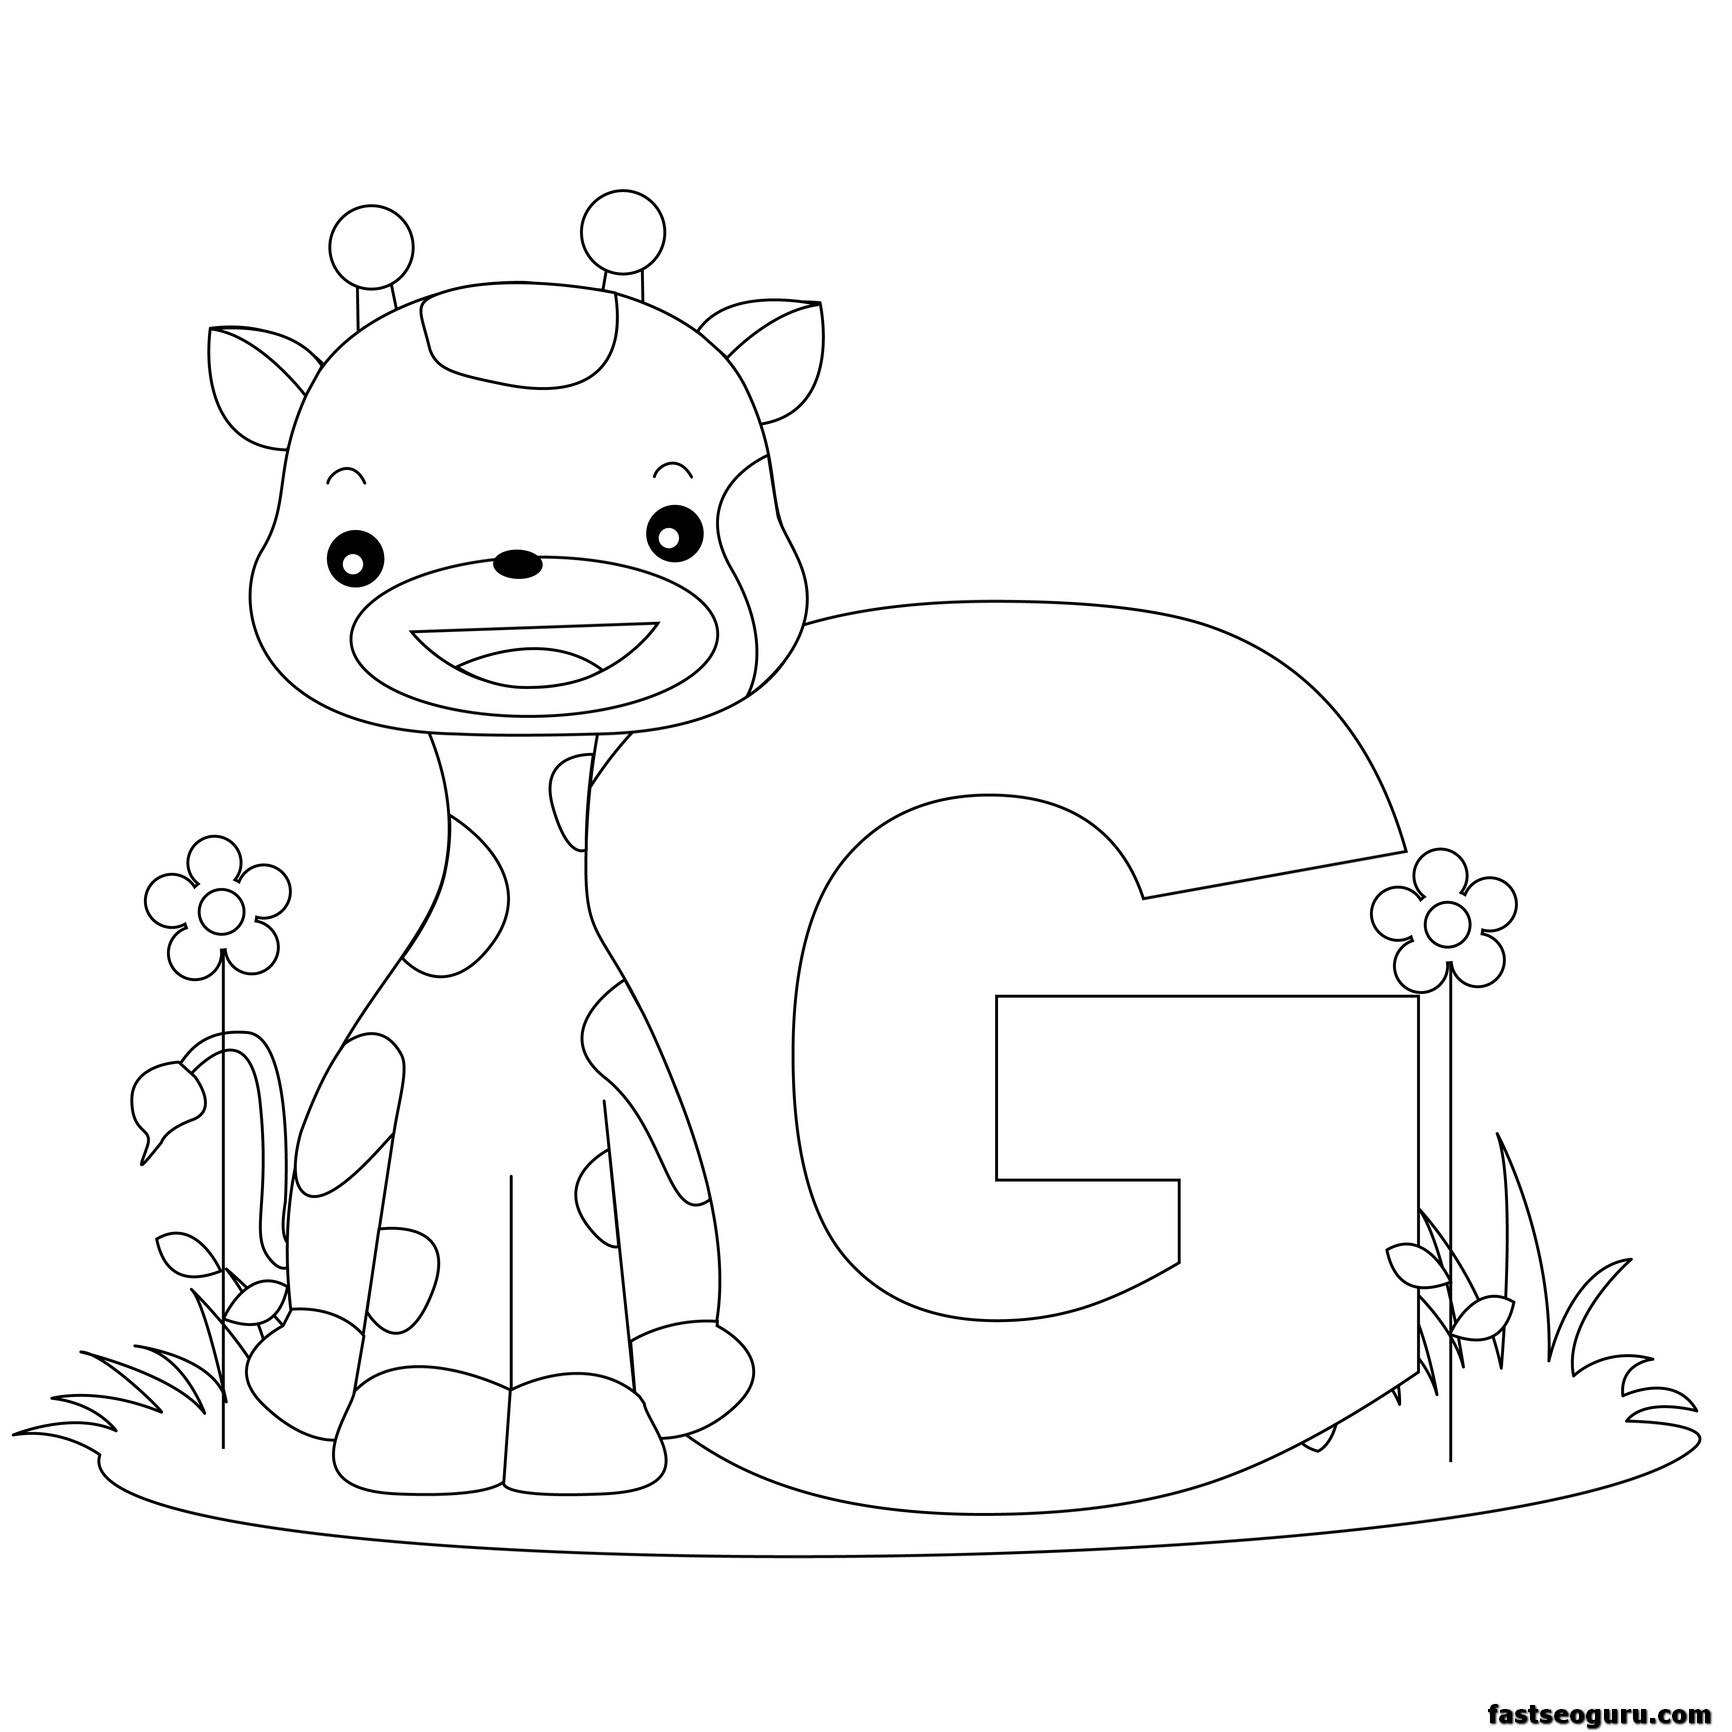 Printable Animal Alphabet Worksheets Letter G Is For